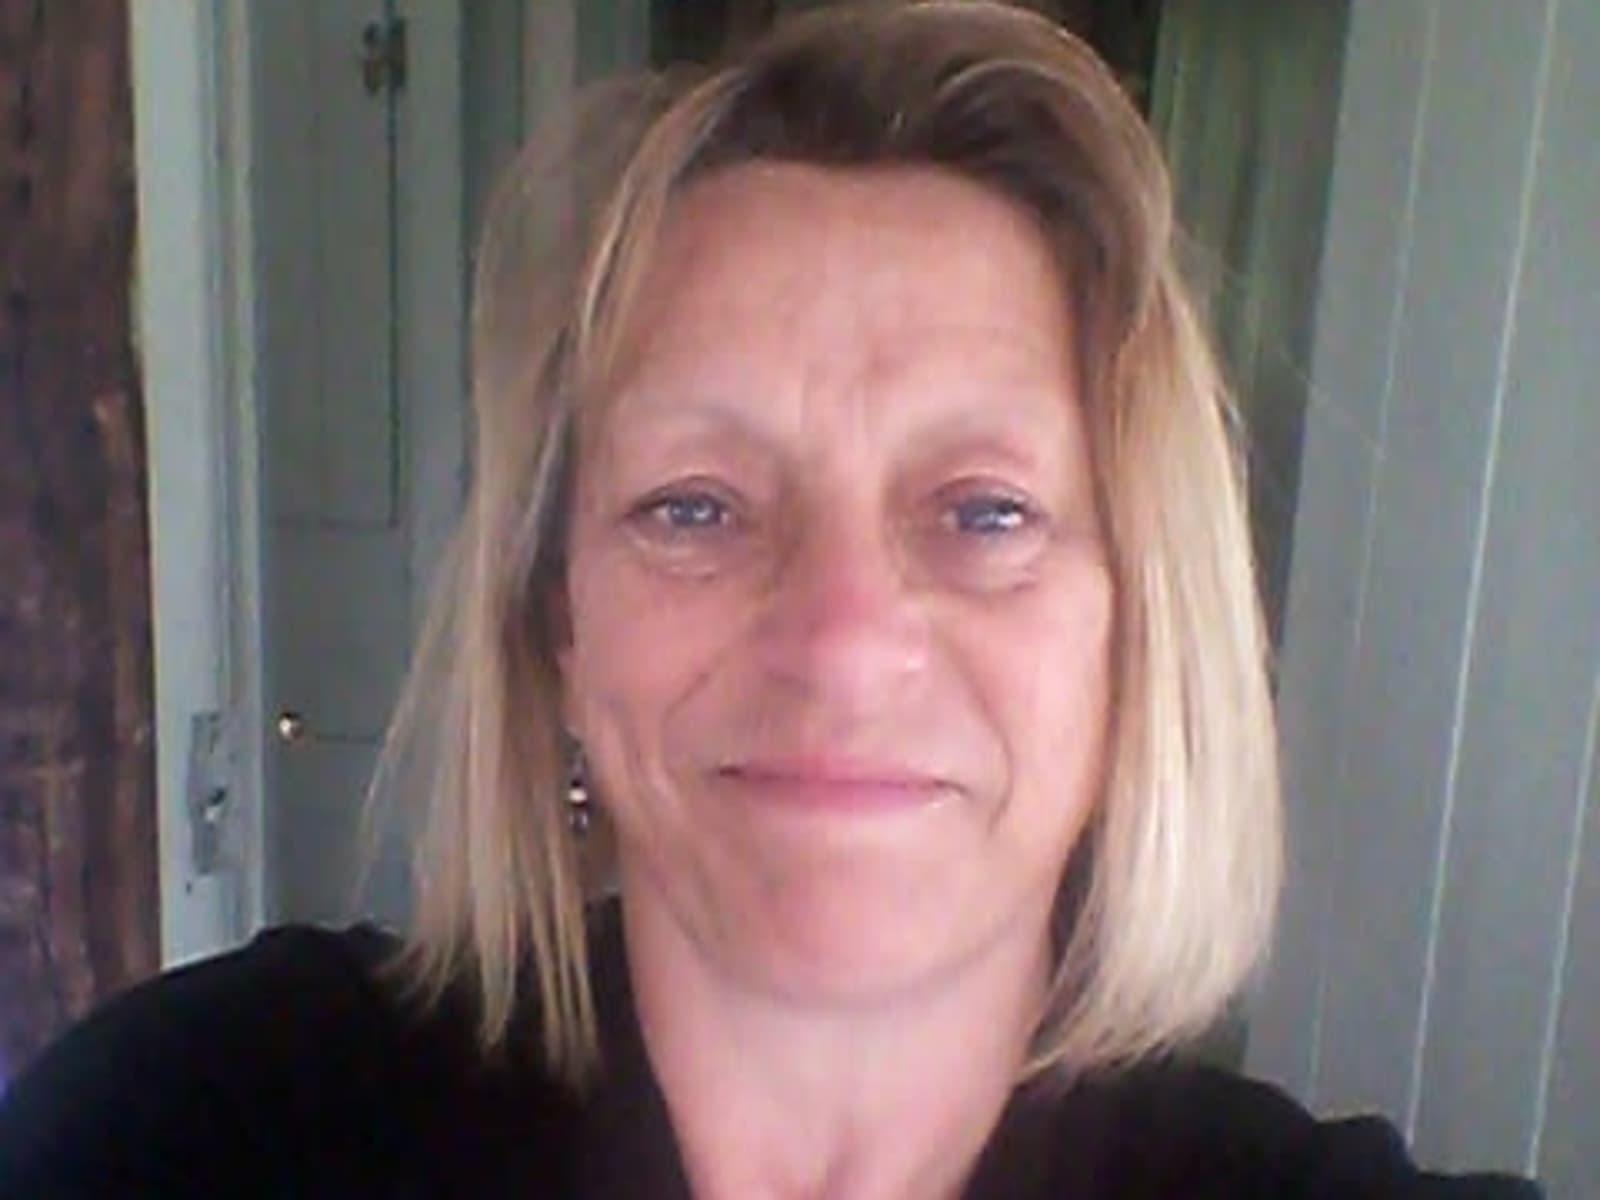 Yvonne from Bury St Edmunds, United Kingdom